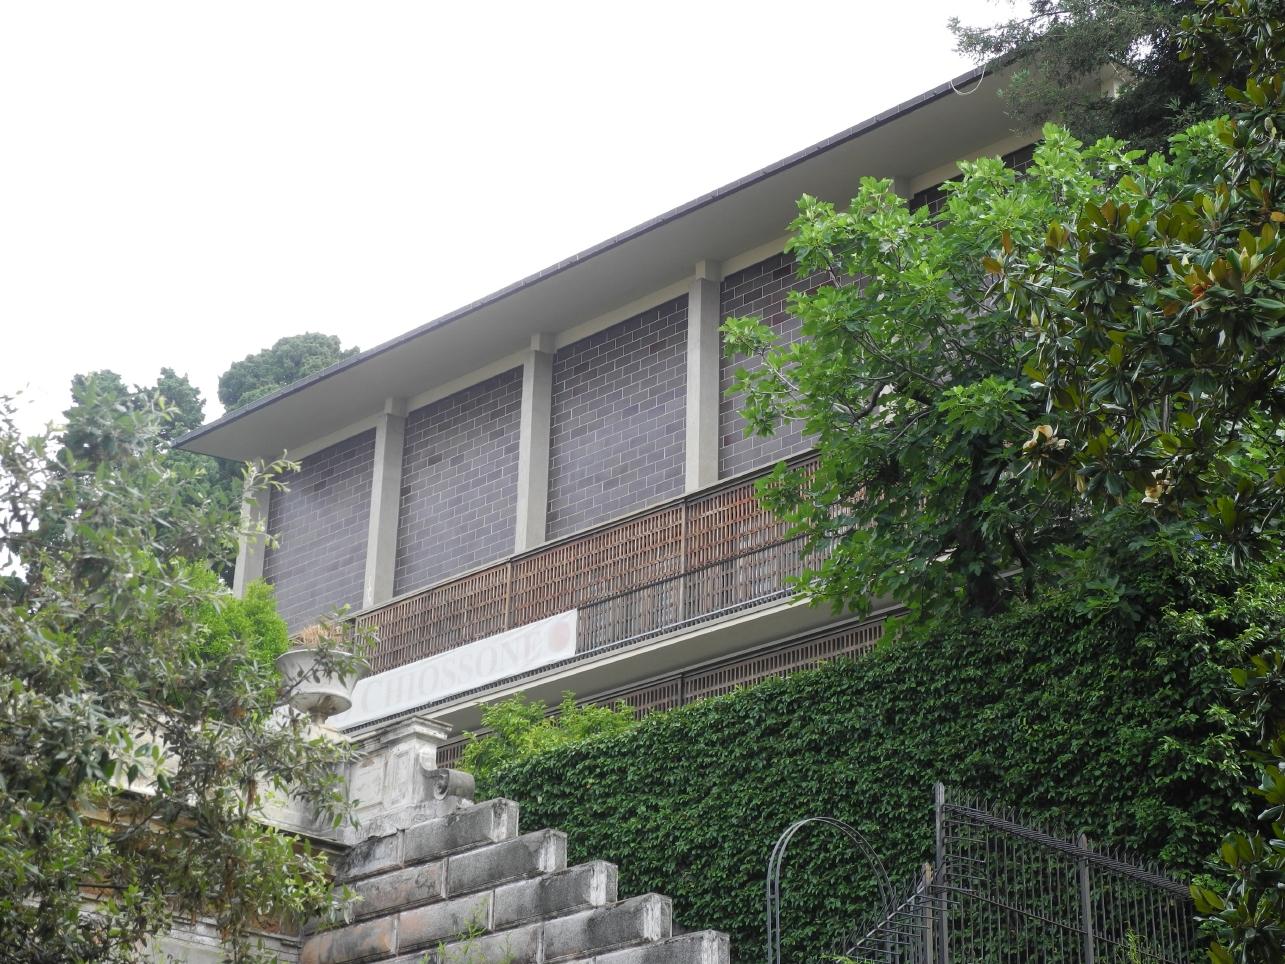 Museo d'Arte Orientale Edoardo Chiossone (museo, d'arte) - Genova (GE)